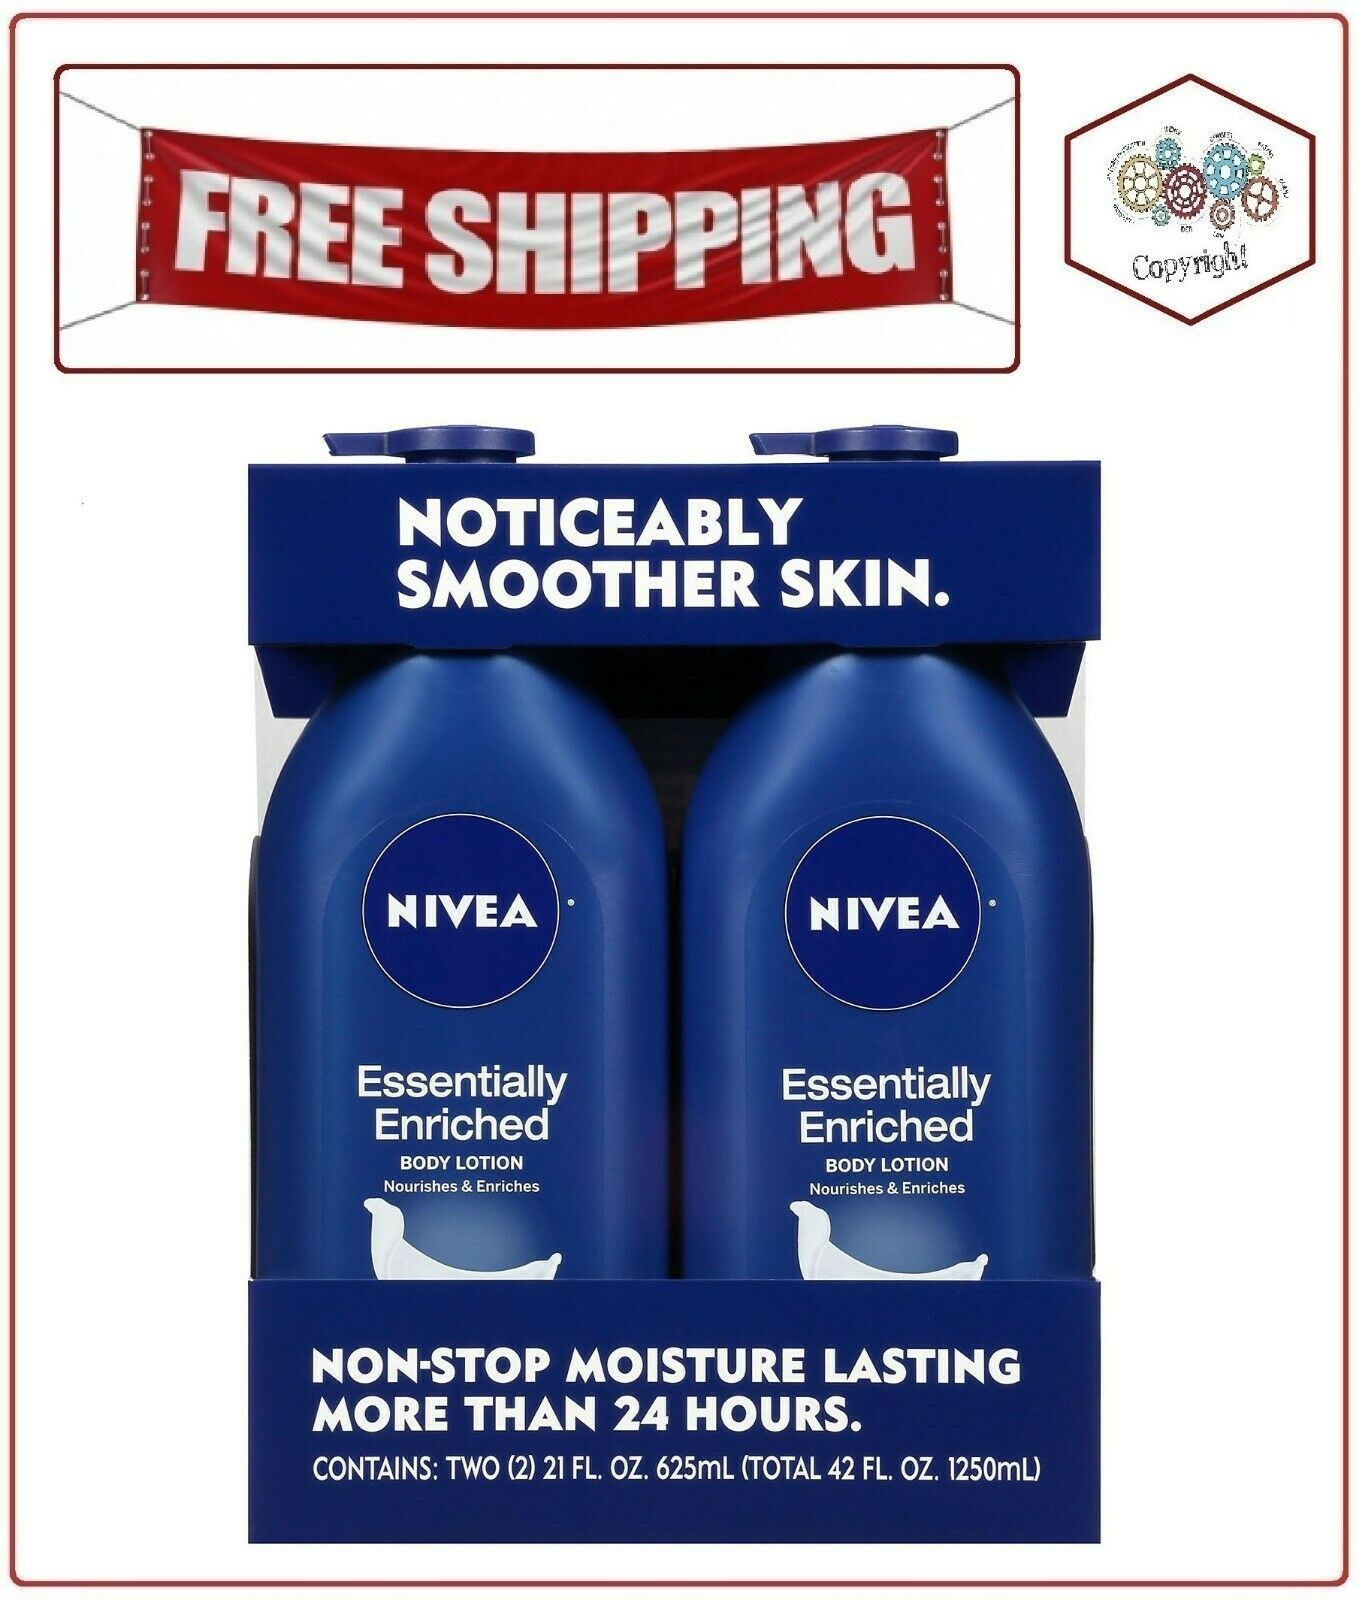 NIVEA Essentially Enriched Body Lotion,Hydra IQ Plus, 2 Bott